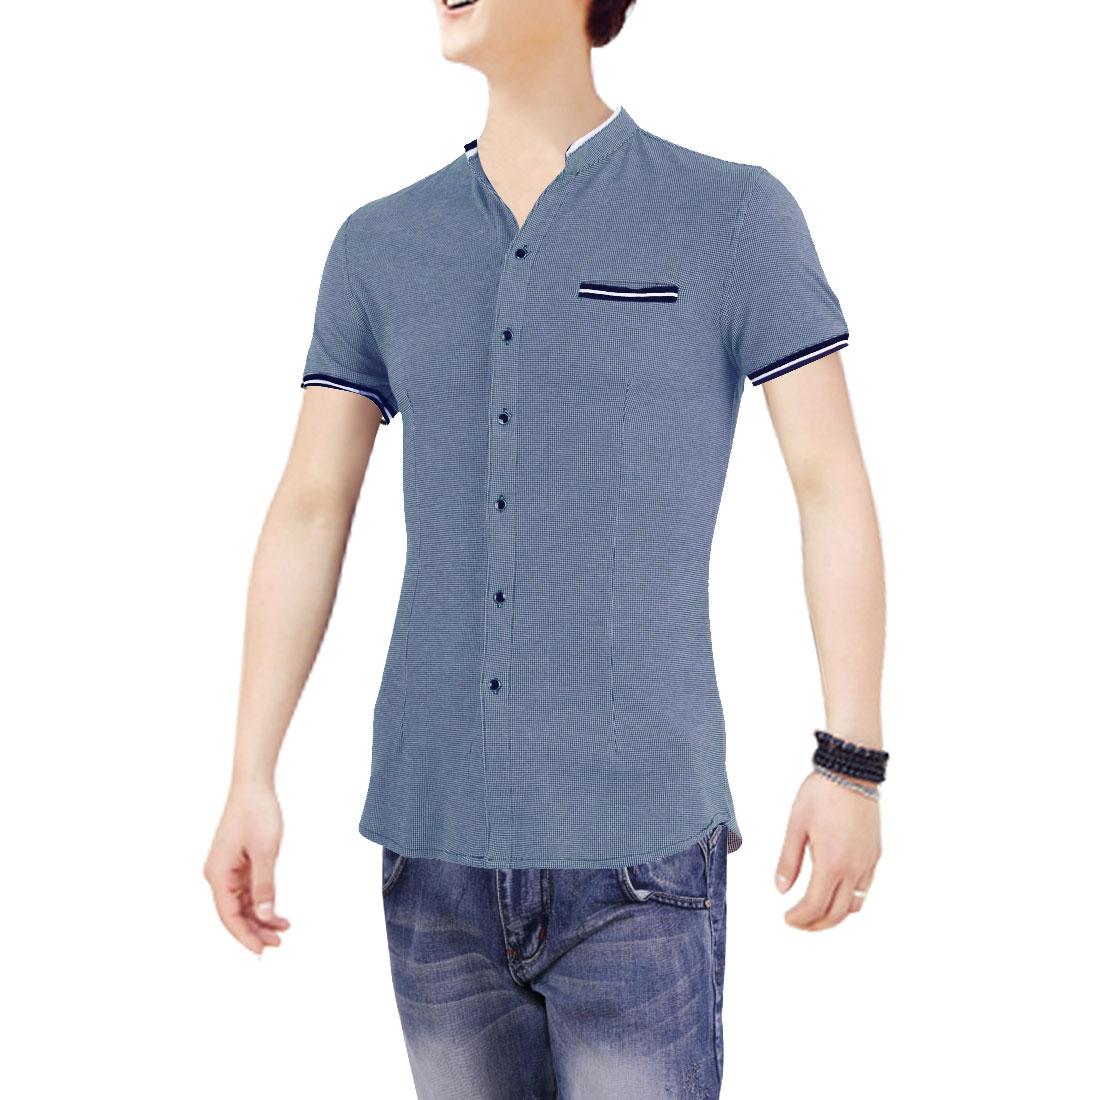 M Men Short Sleeves Design Round Hem Single Breasted Shirt Gray Blue